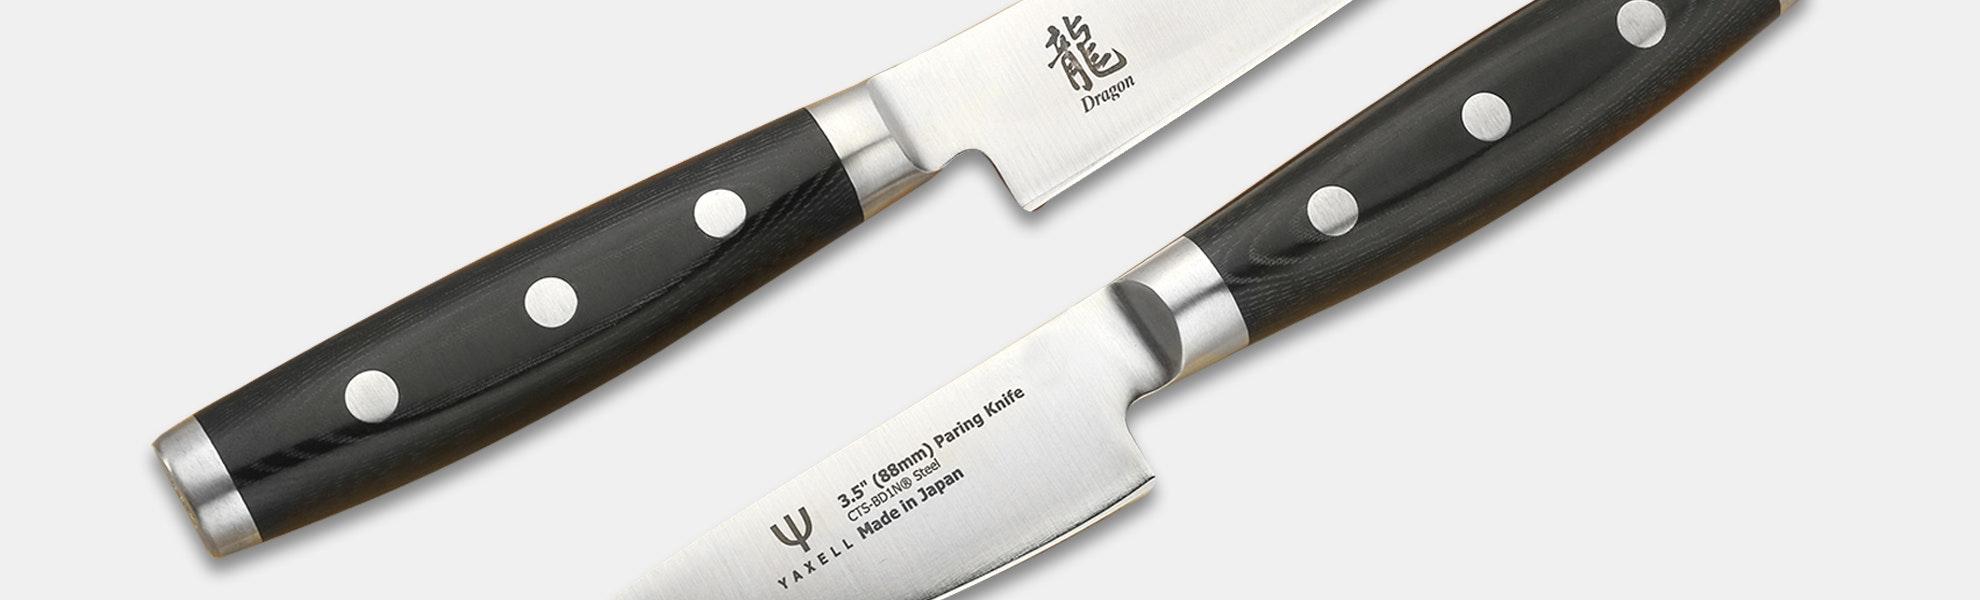 Apogee Culinary Dragon BD1N Kitchen Knives (Pick 2)